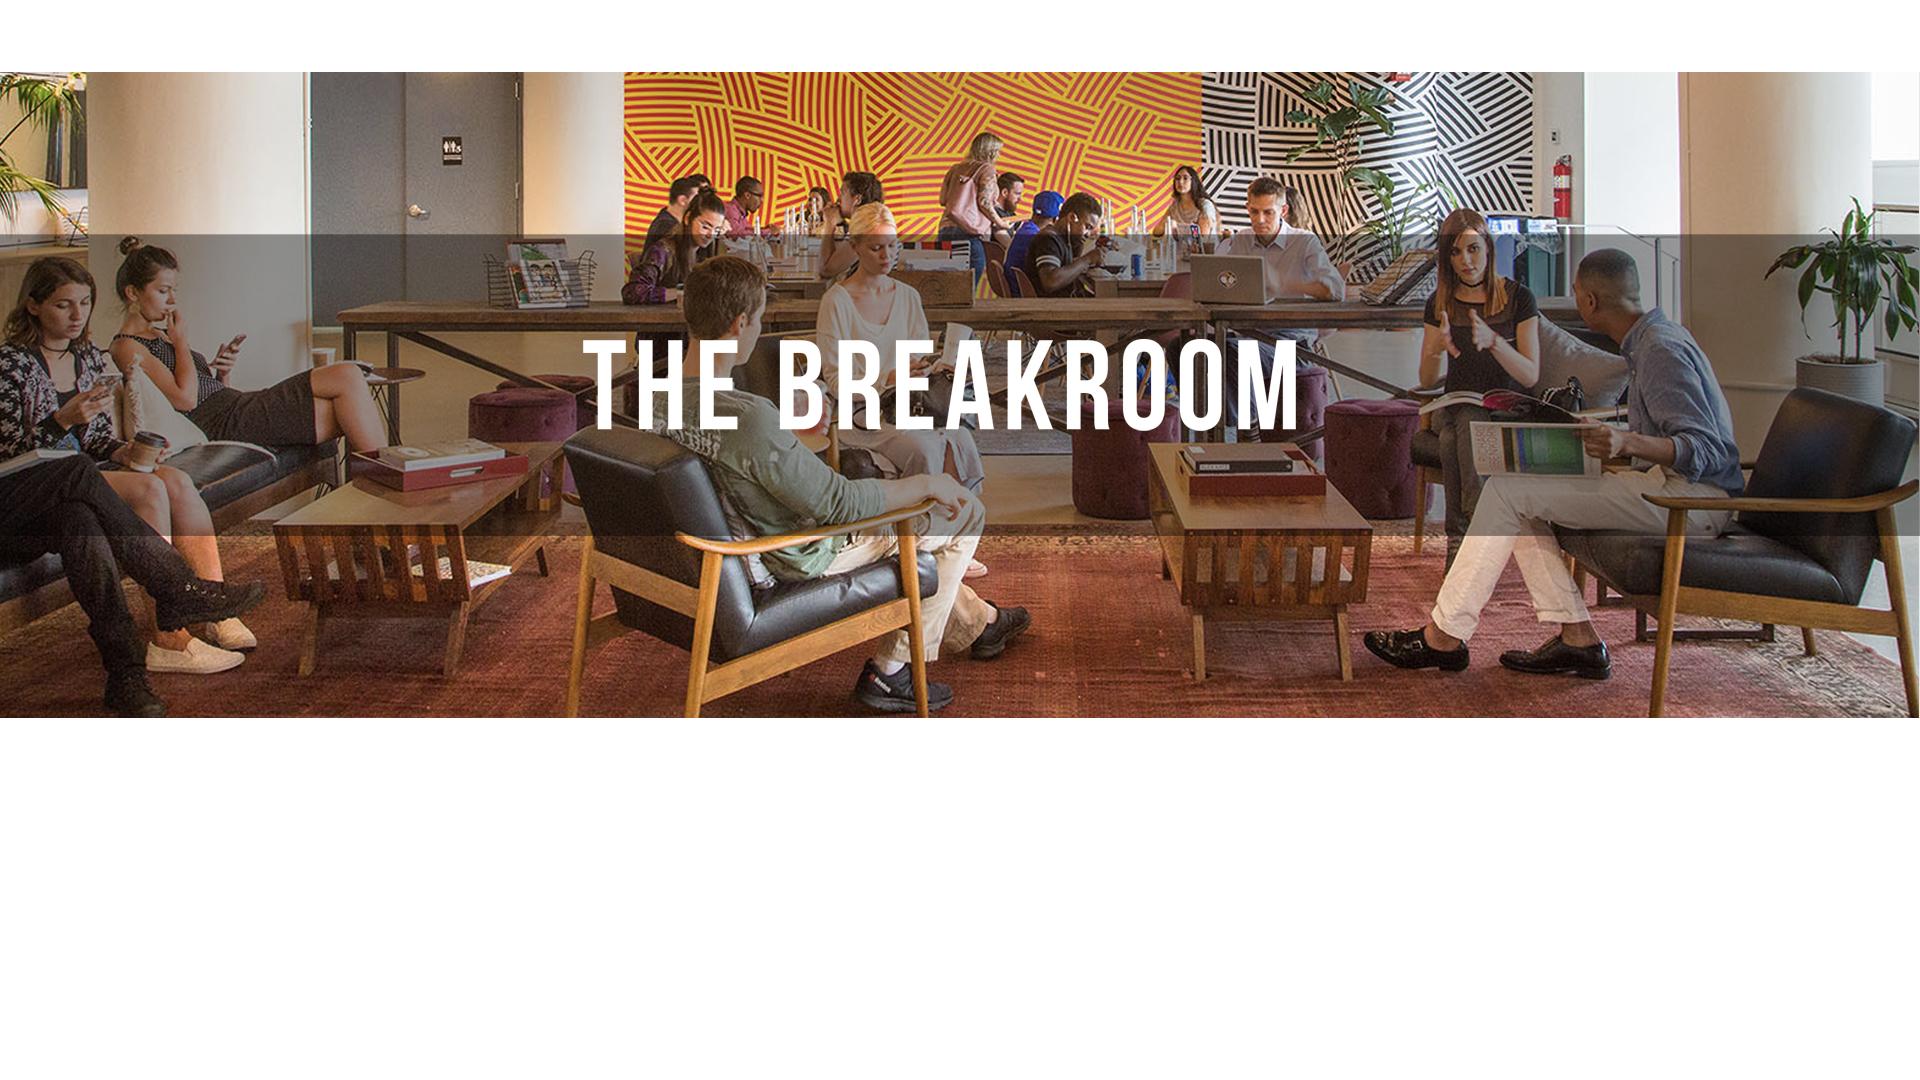 breakroom faux banner.jpg